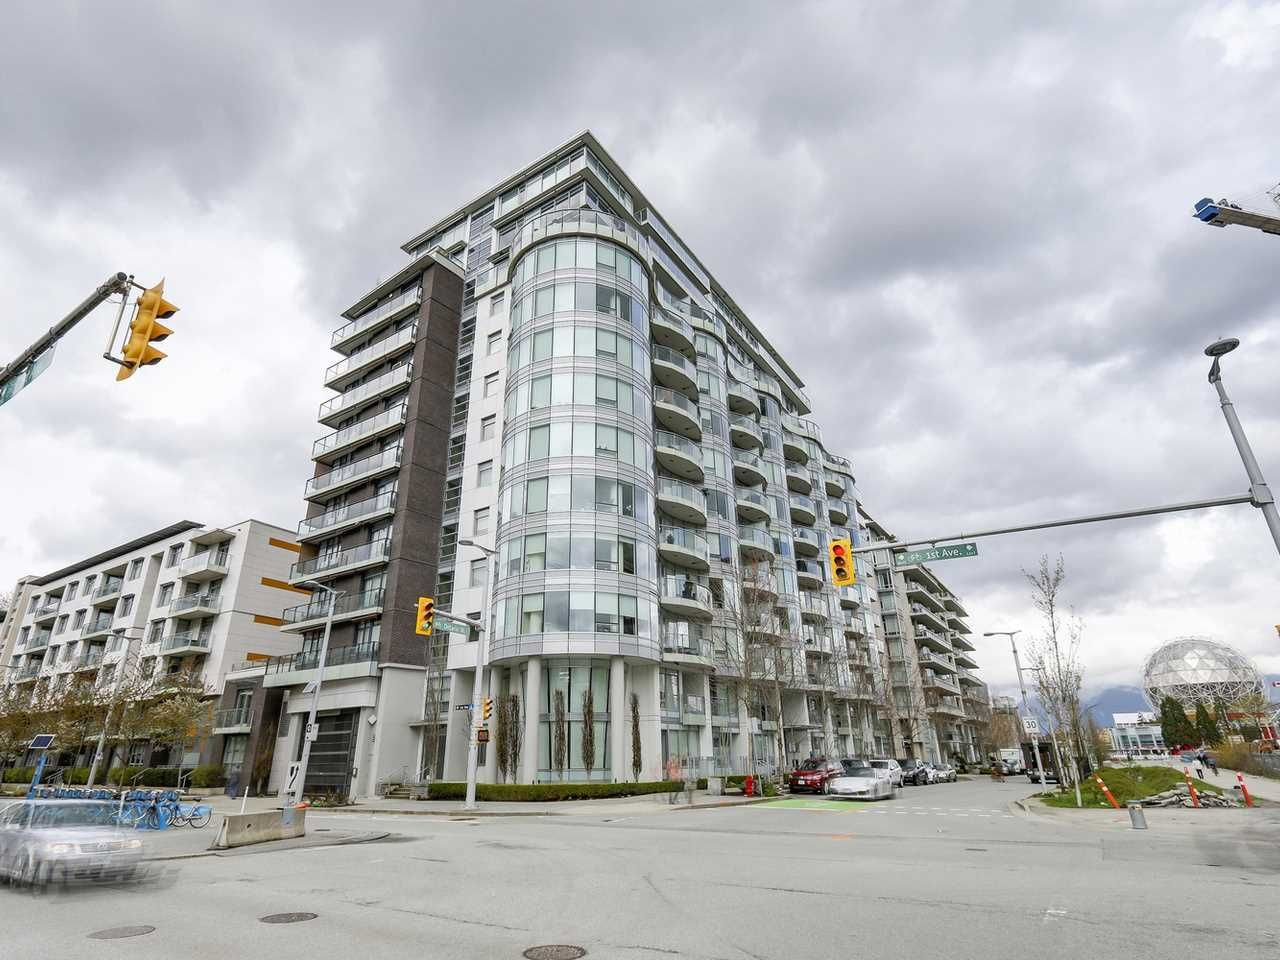 Main Photo: 309 1661 ONTARIO STREET in Vancouver: False Creek Condo for sale (Vancouver West)  : MLS®# R2157053